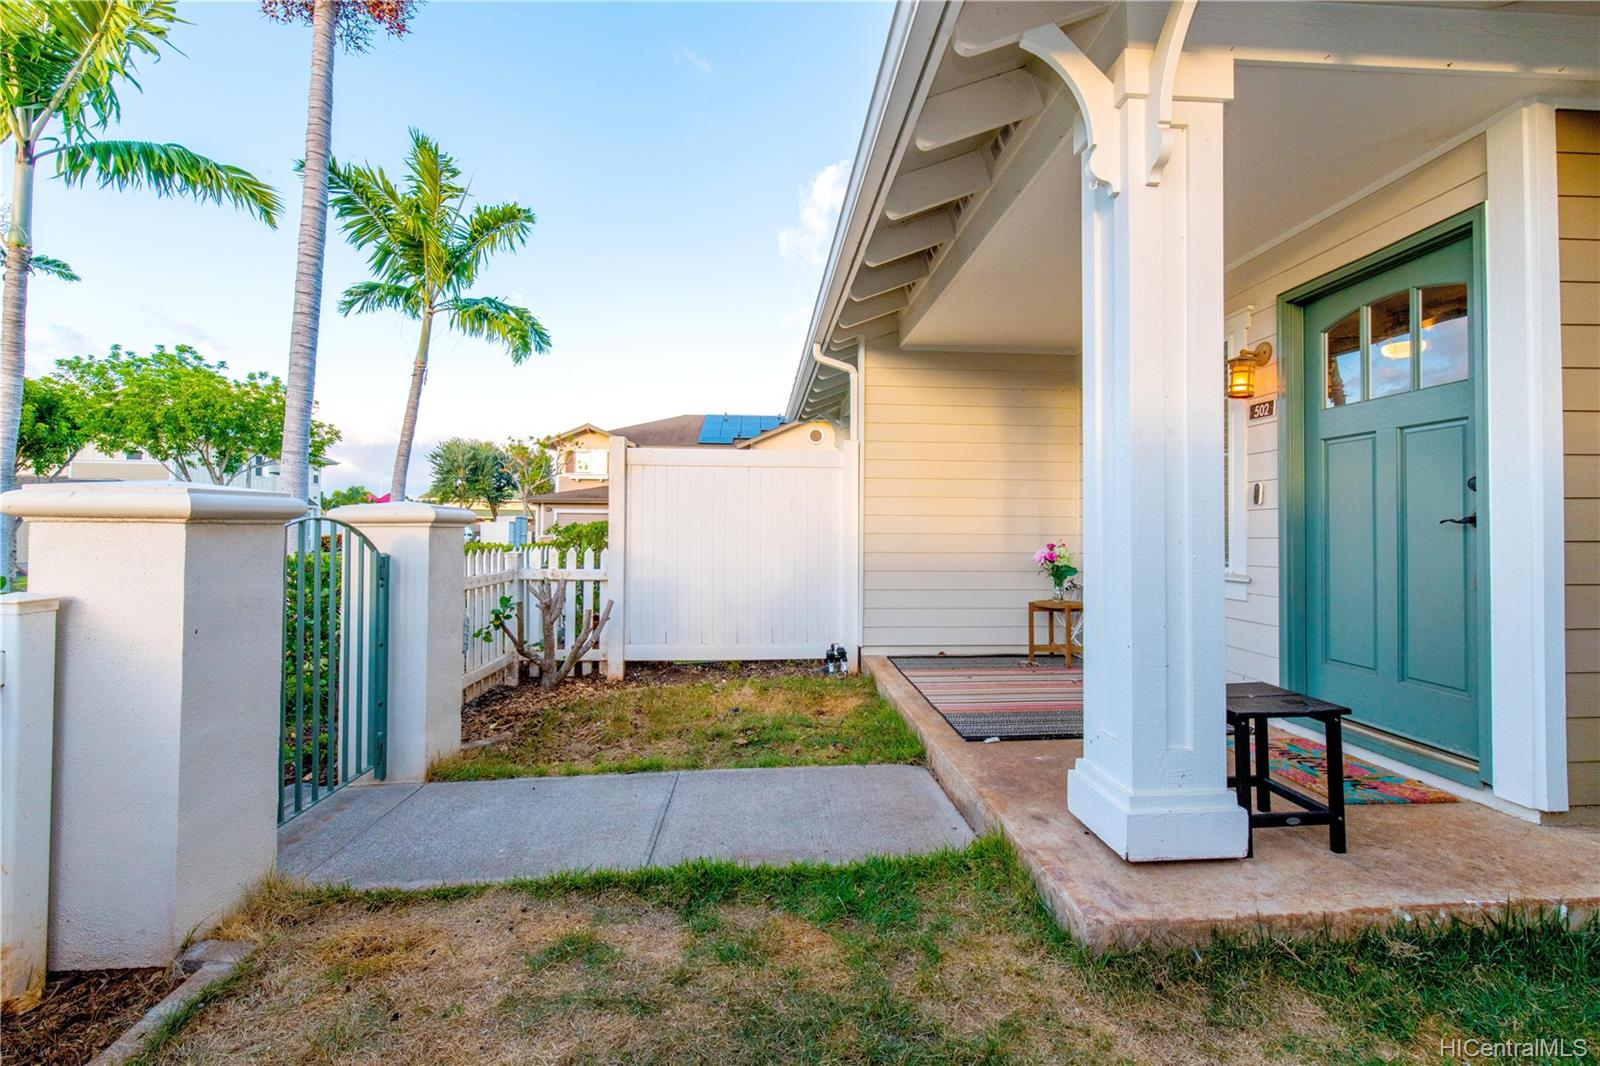 91-1015 Kaipalaoa Street townhouse # 502, Ewa Beach, Hawaii - photo 19 of 21